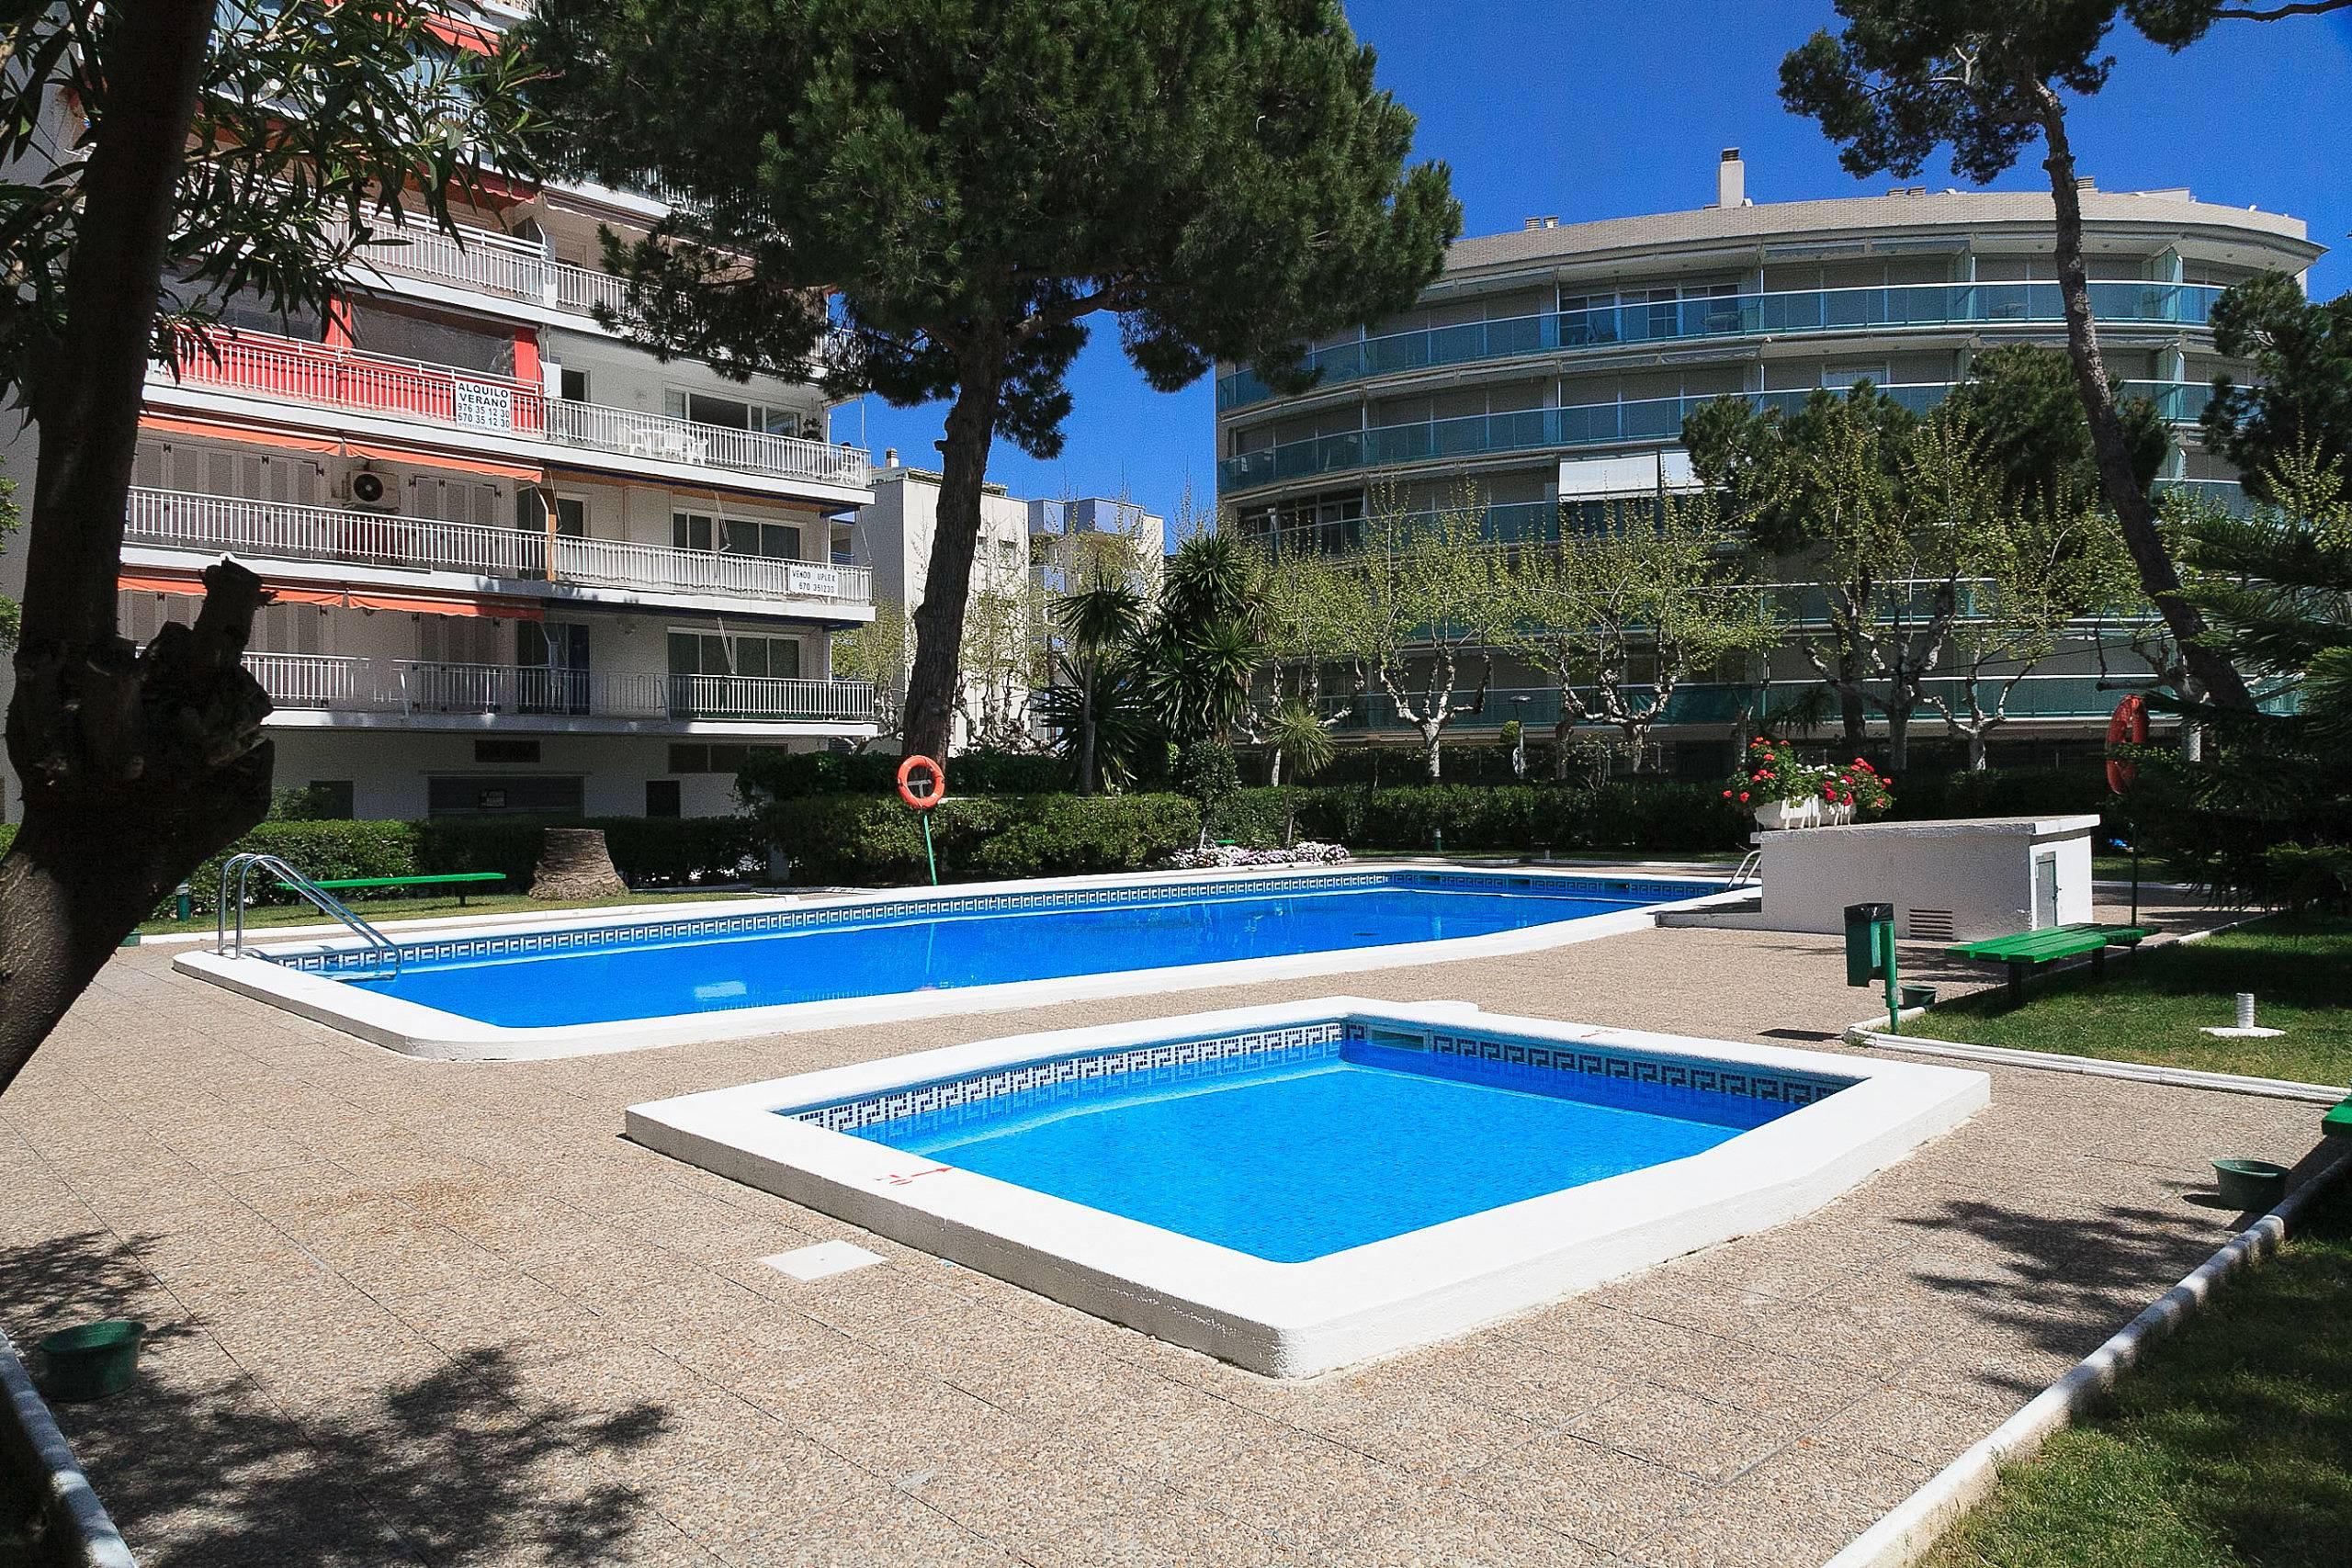 Alquiler apartamento gisamar en salou costa dorada - Alquiler casas vacacionales costa dorada ...